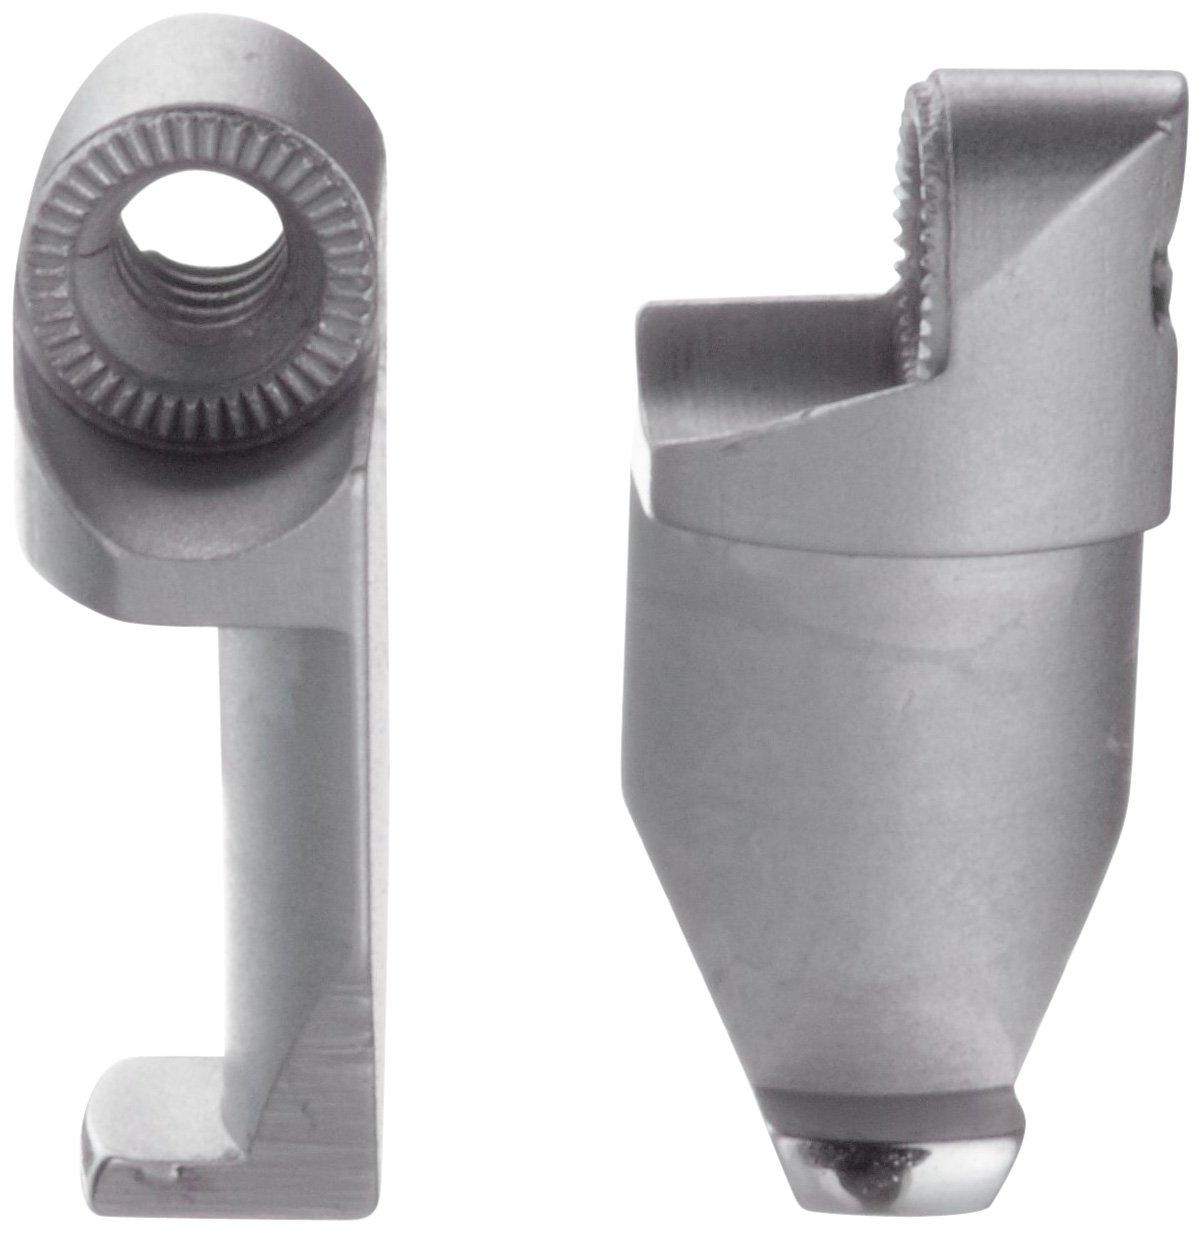 Brown /& Sharpe TESA 079112126 Flat Bottom Adjustable Contact Arm Ends for Bores = 6mm Hexagon Metrology B005007H56